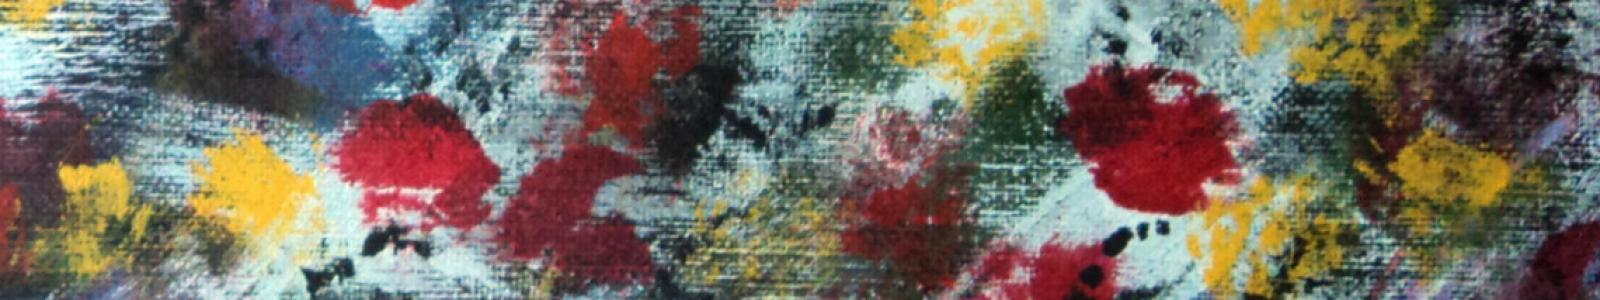 Gallery Painter Sergey Babkov